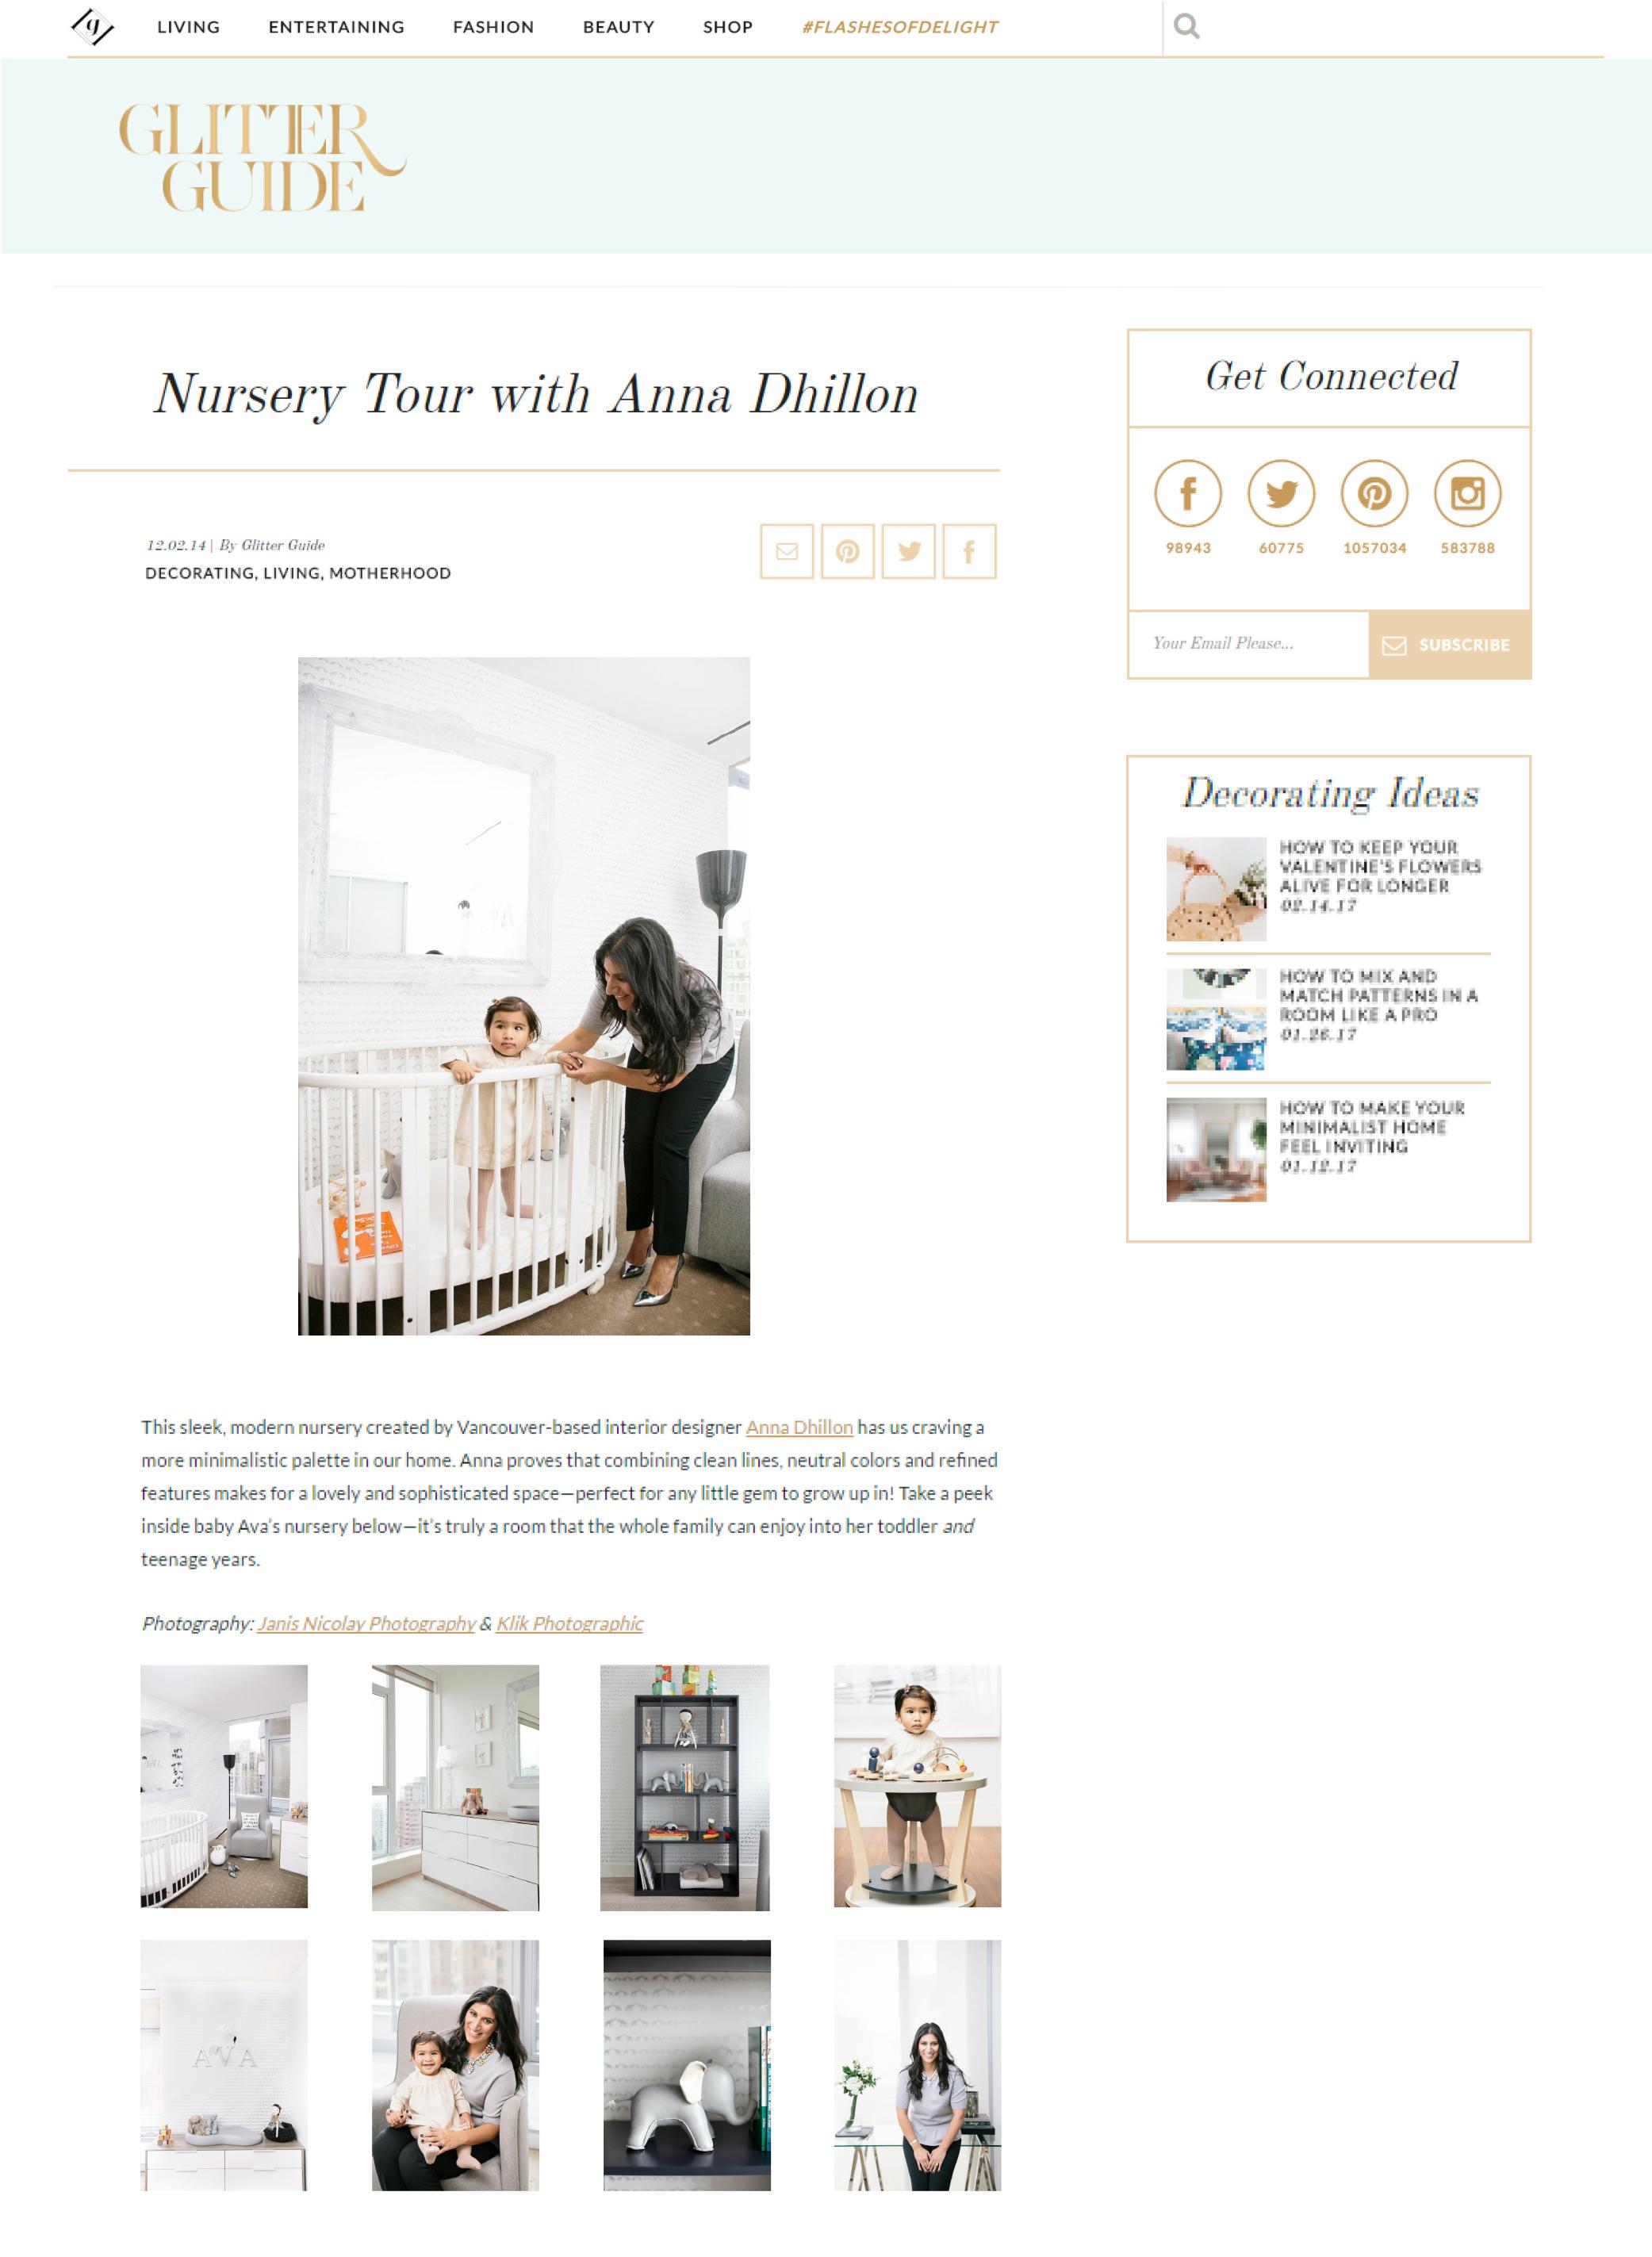 14_12-Glitter_Guide-Nursery_Tour_With_Anna_Dhillon.jpg